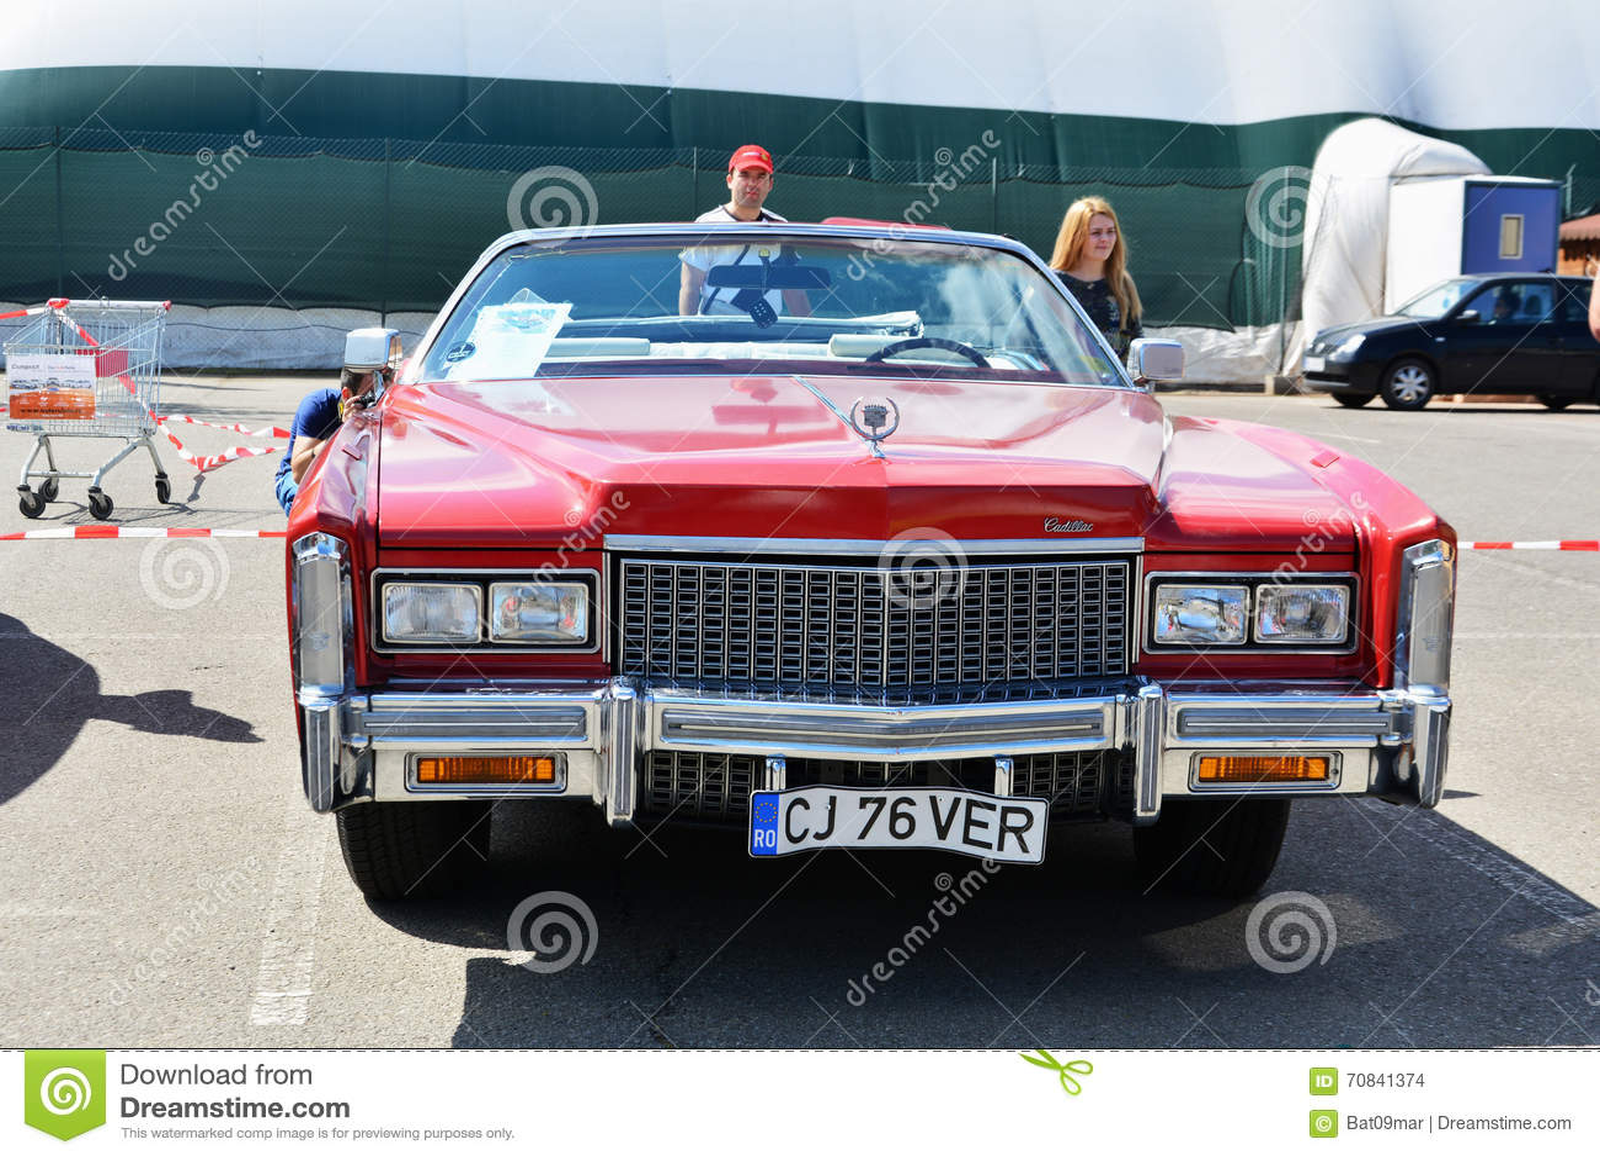 2016 Cadillac Convertible >> Cadillac Eldorado Convertible 1976 Editorial Stock Image Image Of